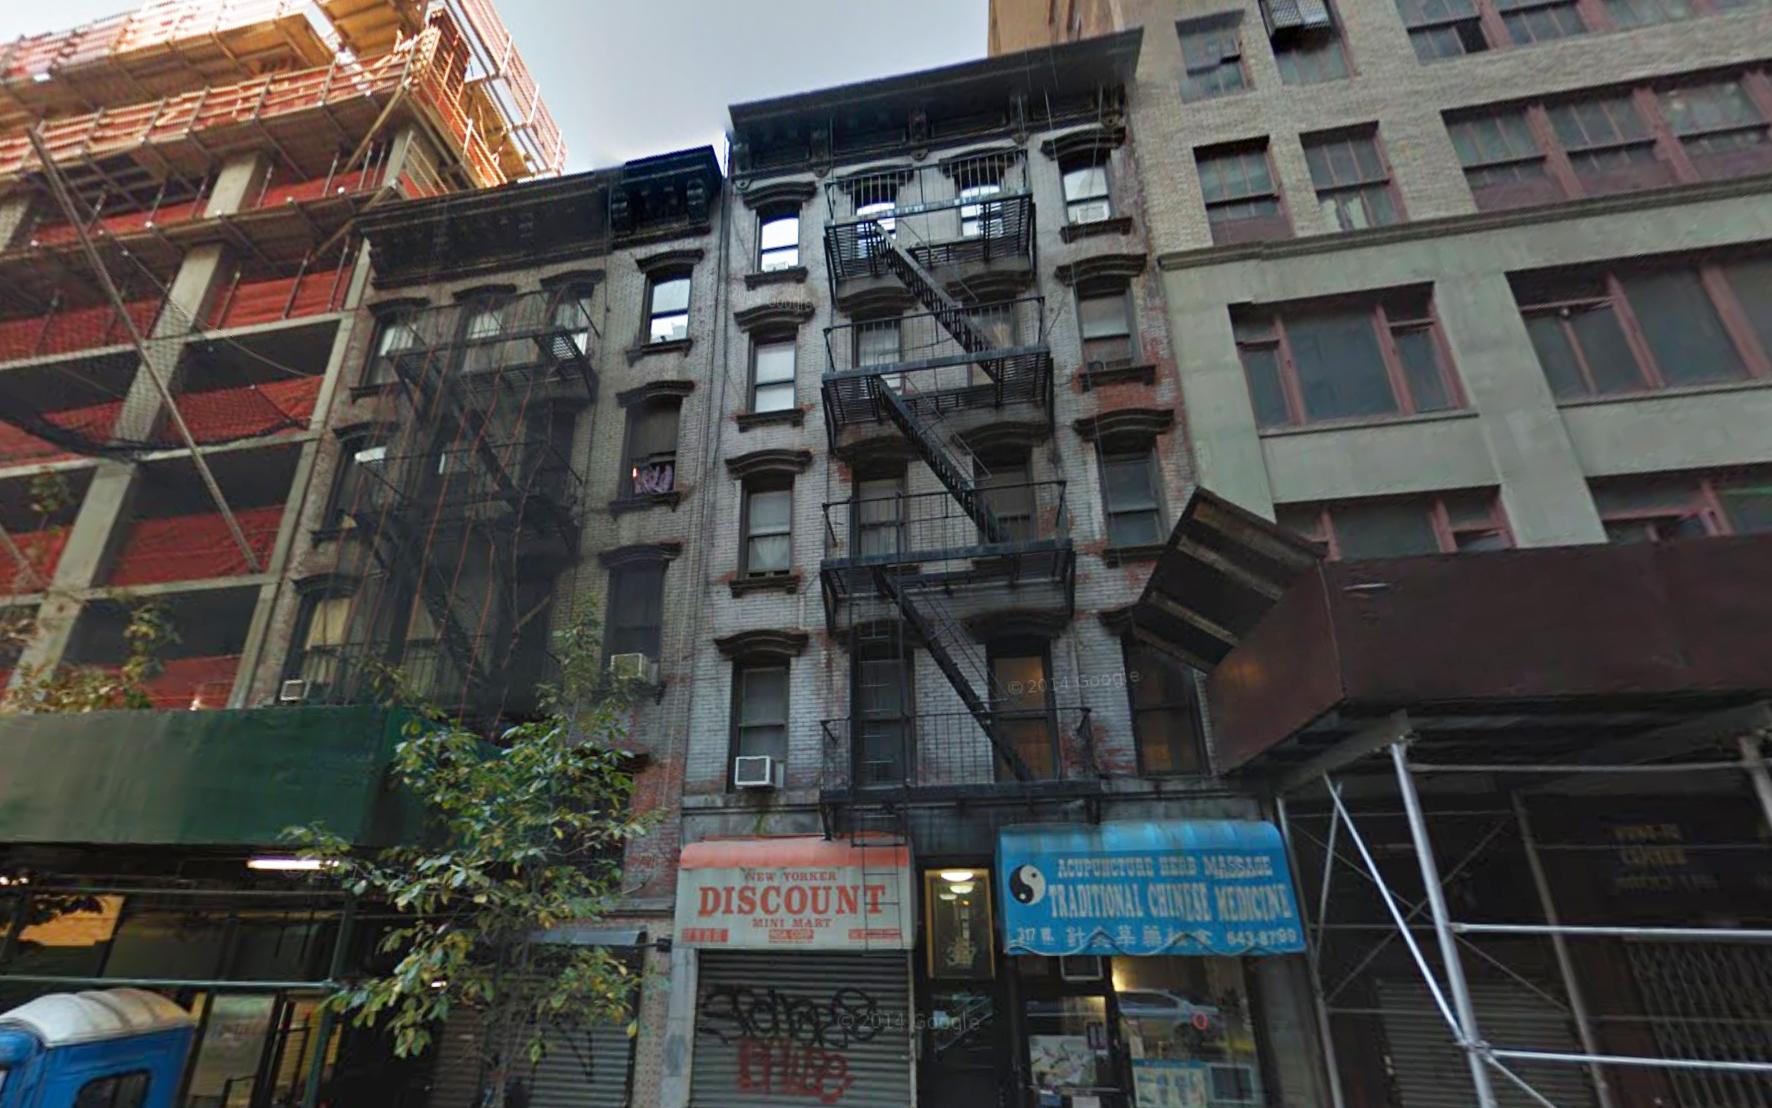 319 West 35th Street, image via Google Maps